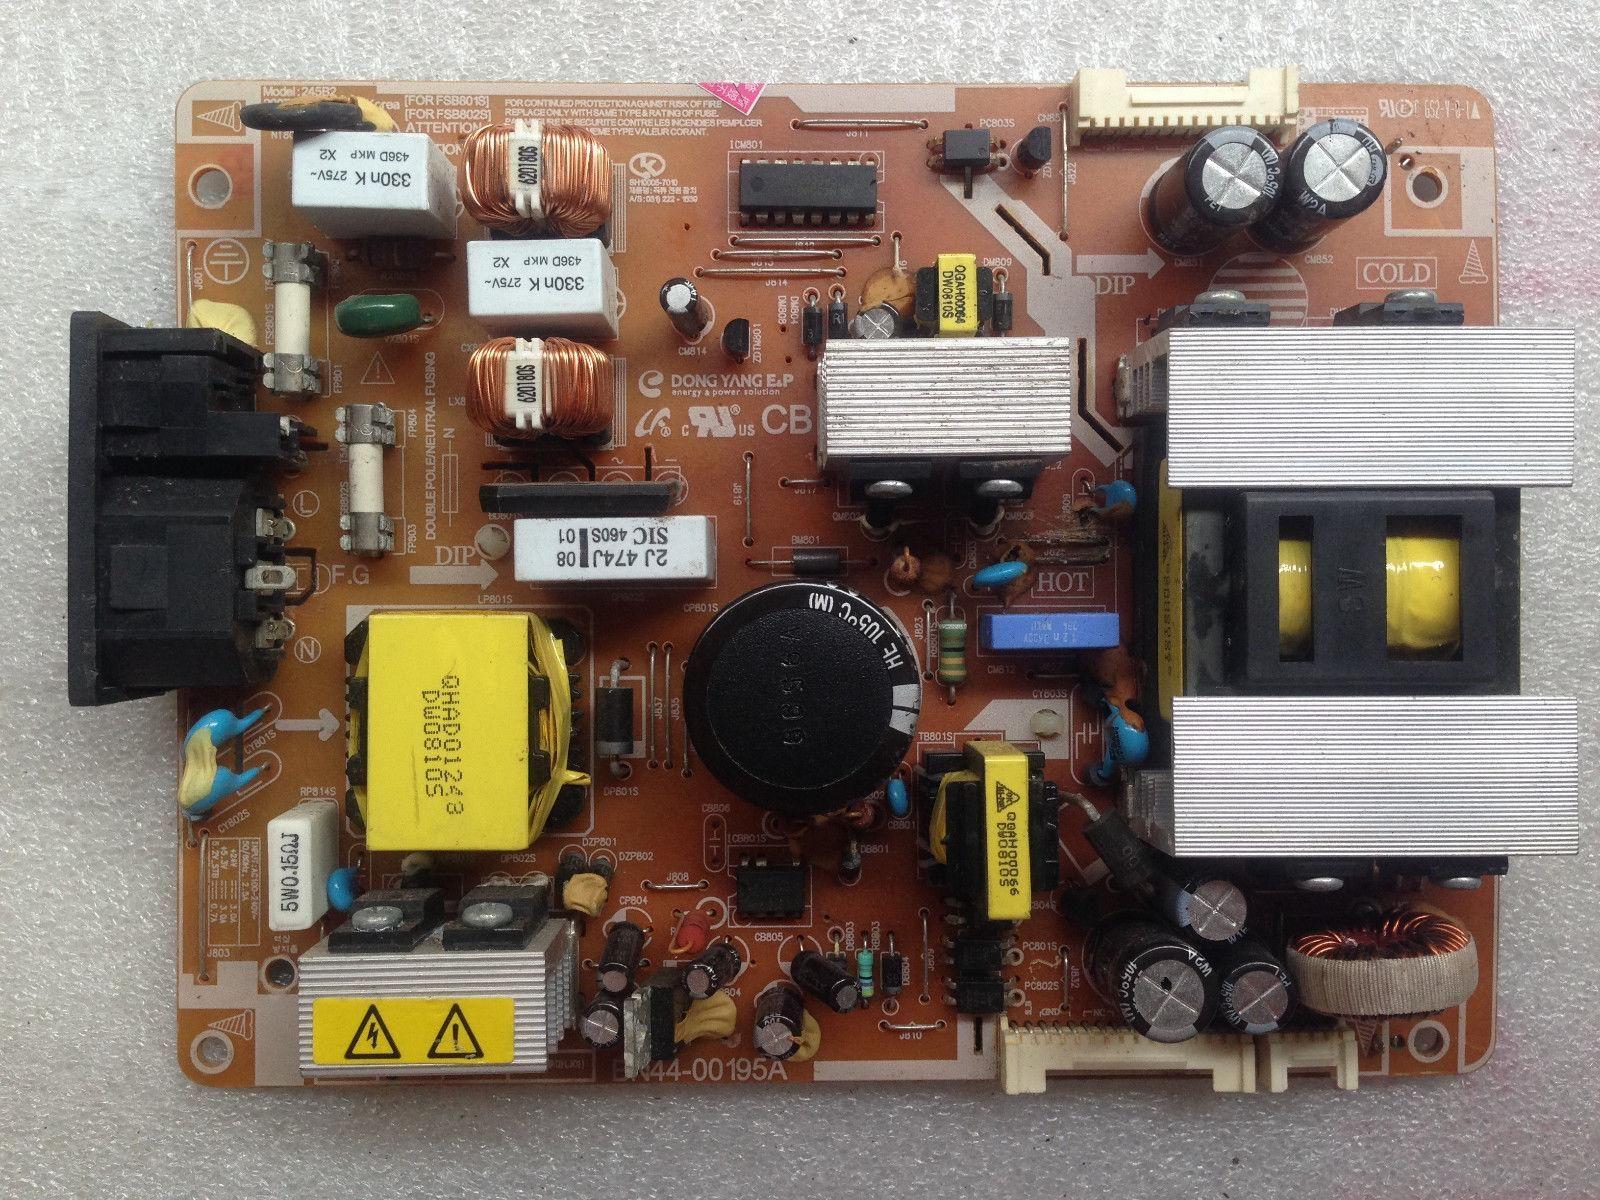 cgjxs Orijinal BN44 -00195a Testi Çalışma Güç Kurulu için Samsung 245b 245b BN44 -00173a